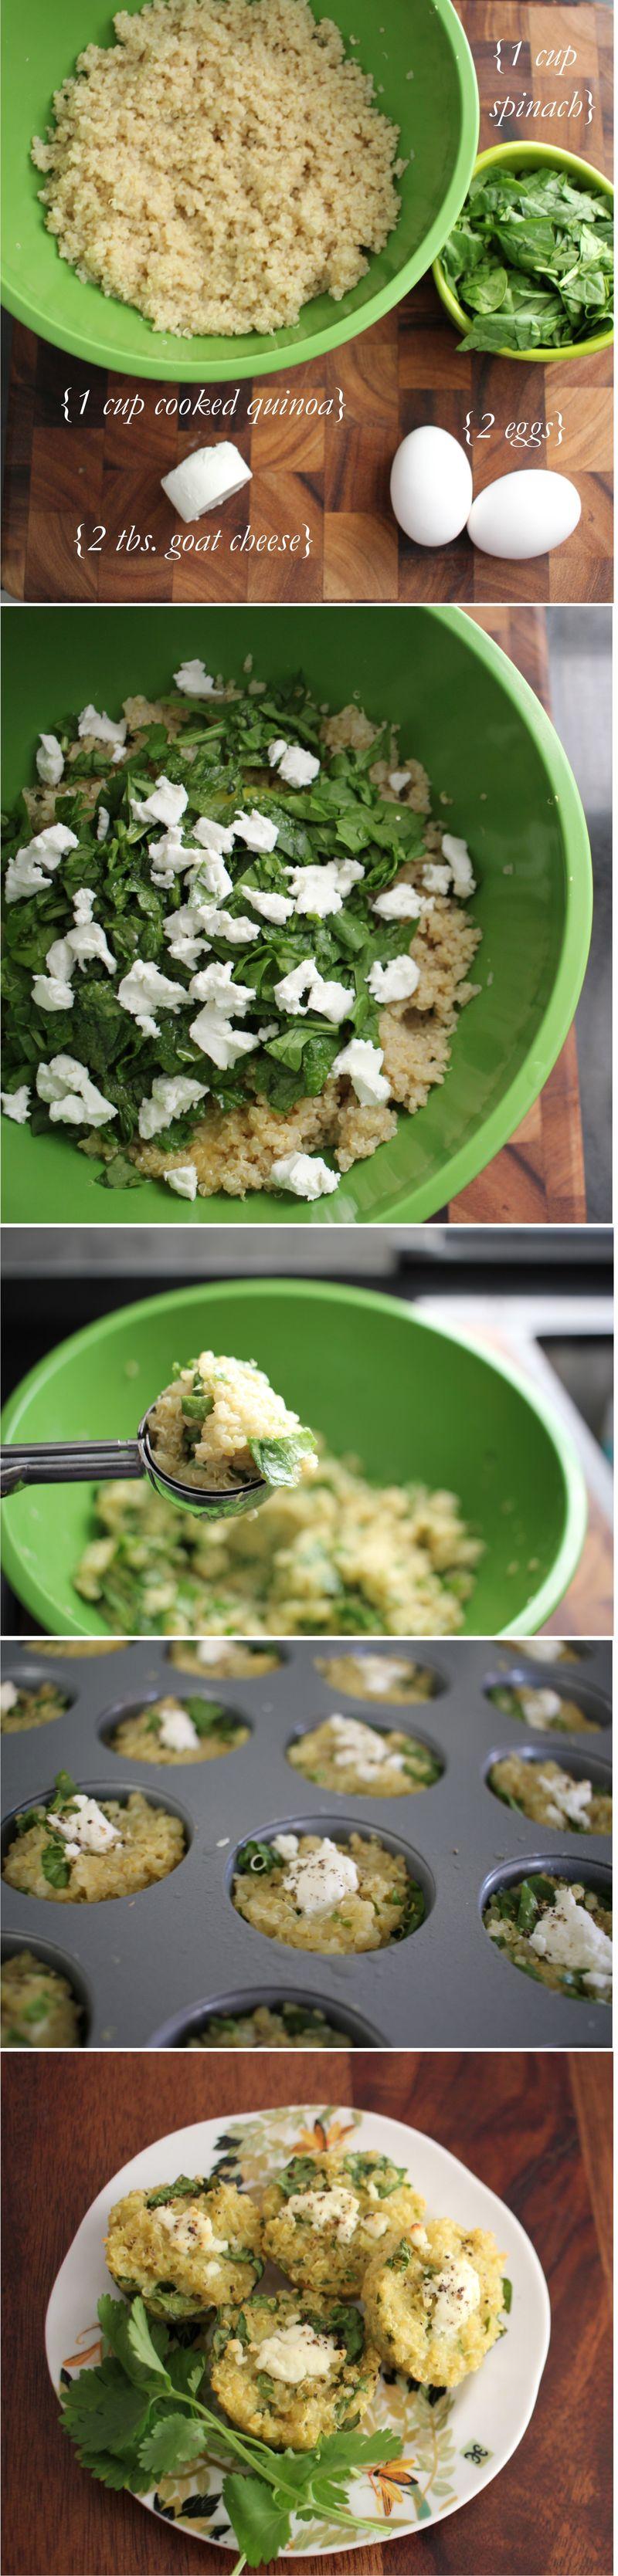 Quinoa muffins steps